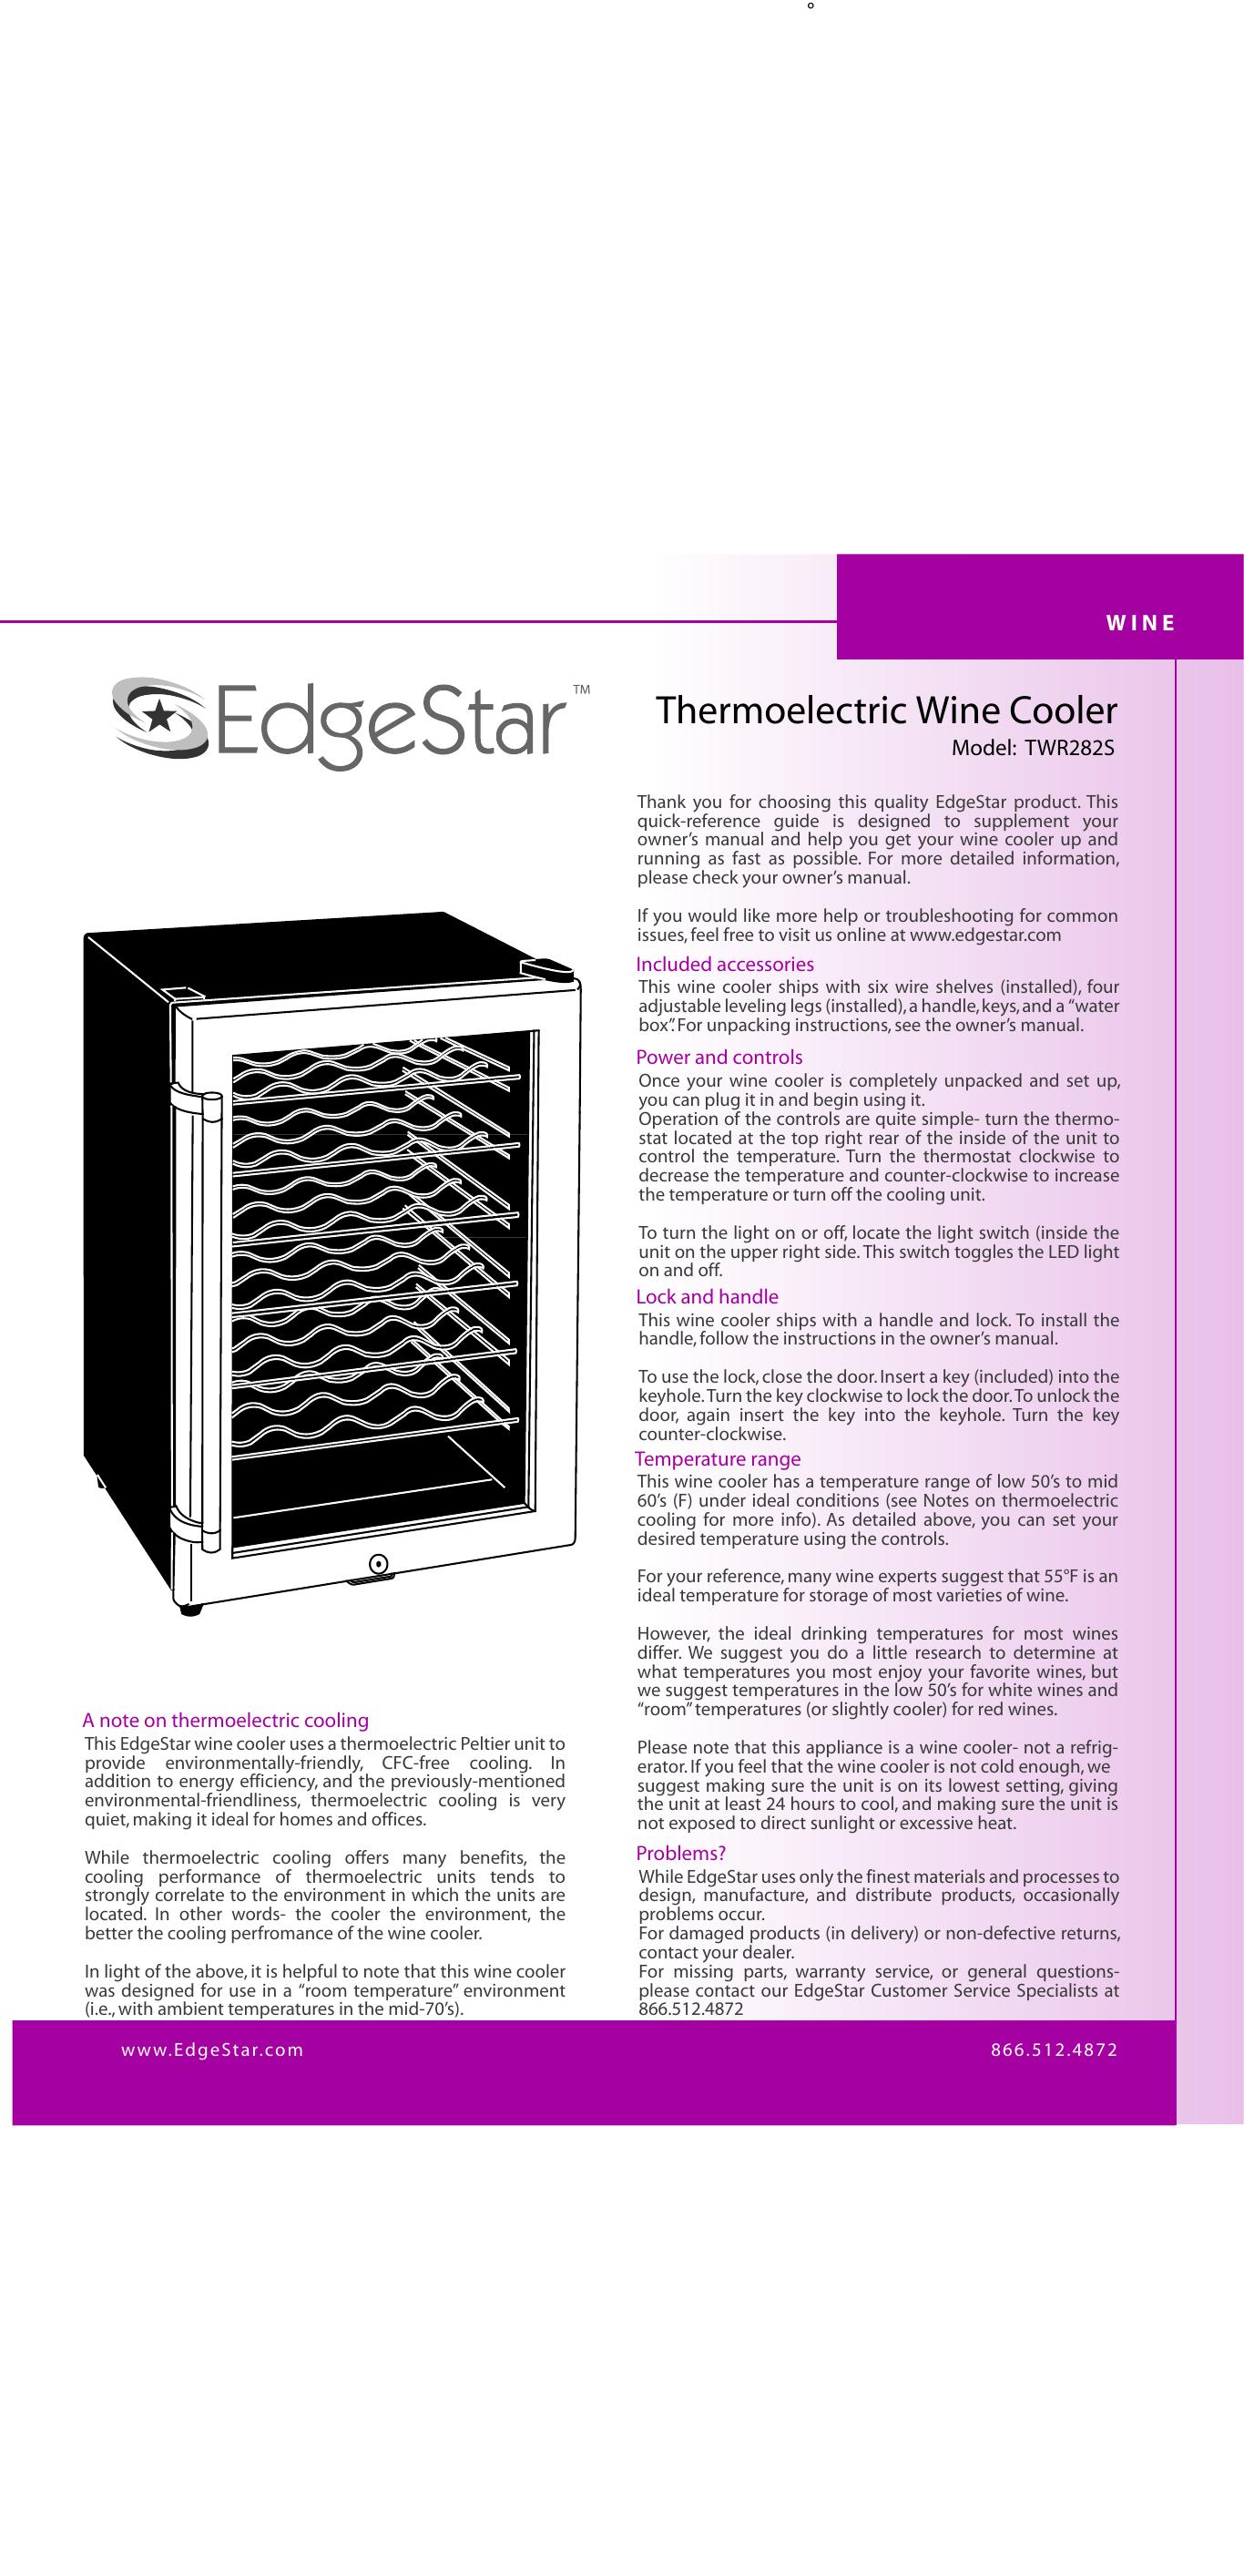 Thermoelectric Wine Cooler | manualzz com